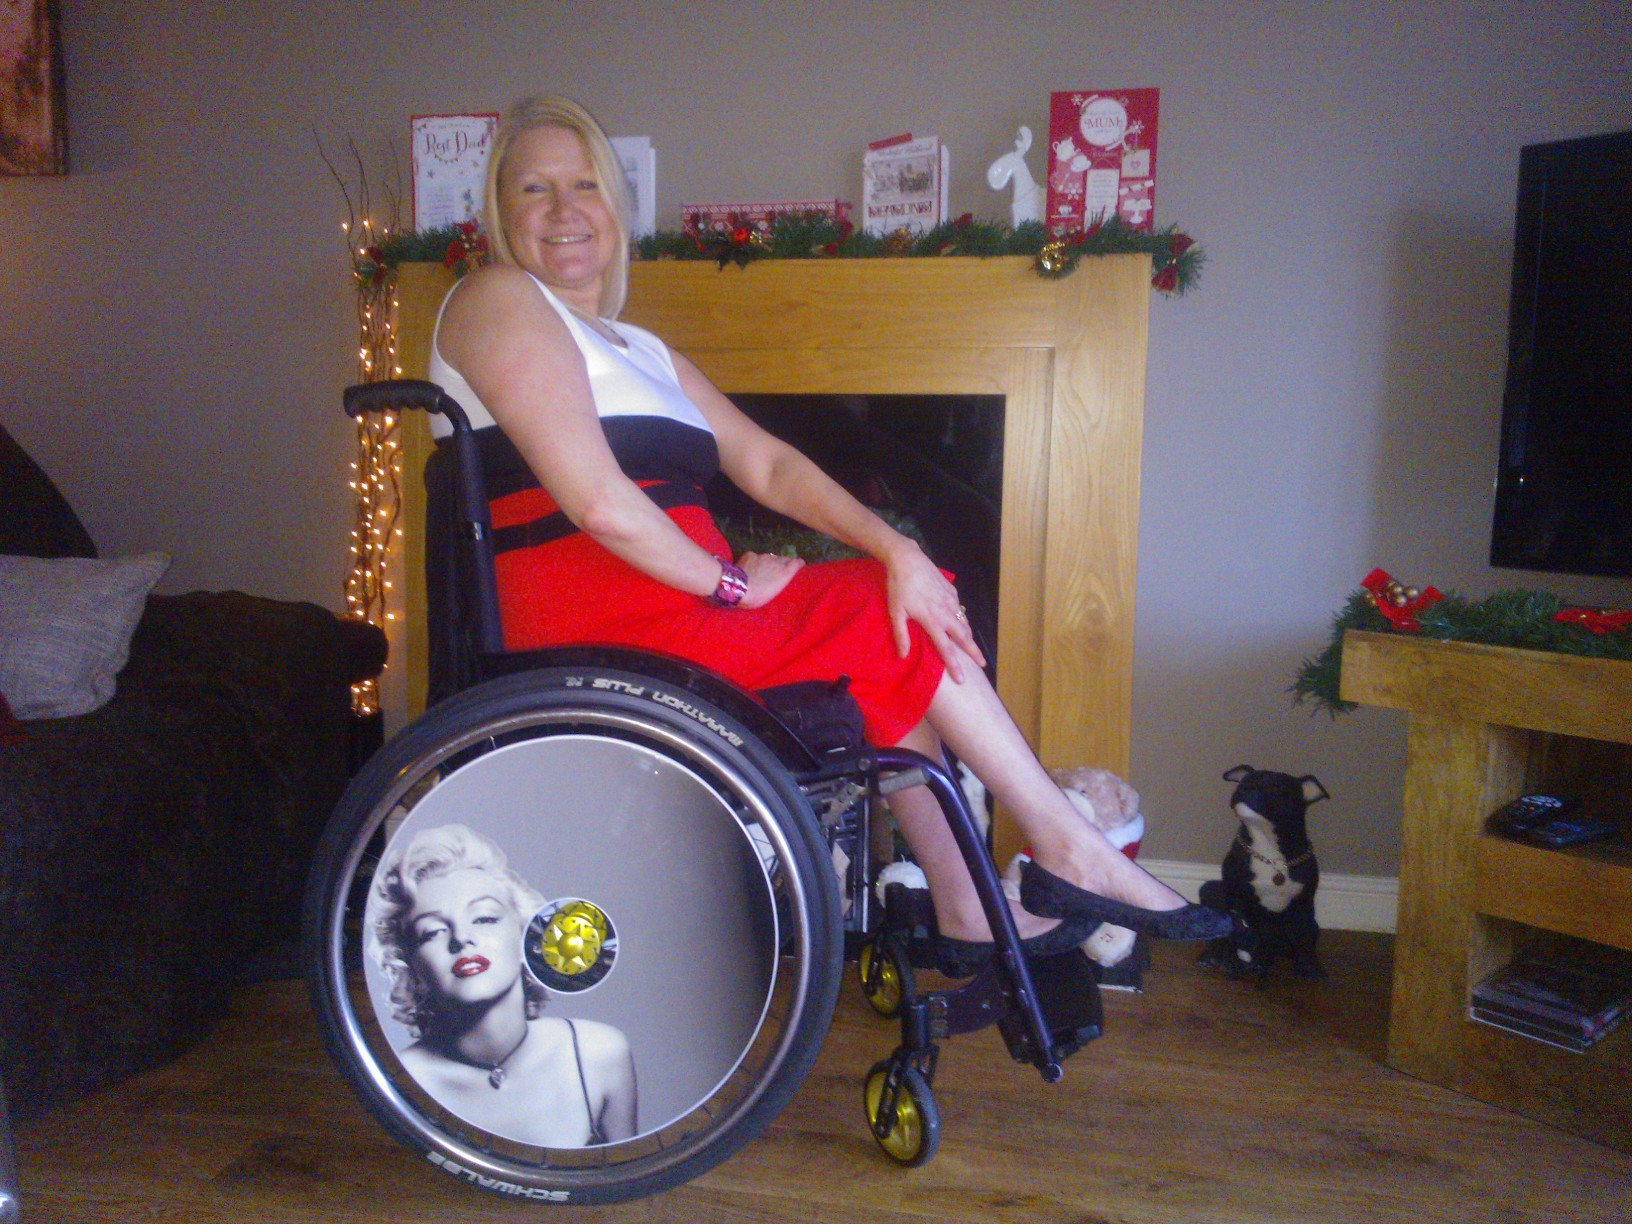 Marilyn Monroe Wheelchair Wheel Covers SpokeGuards